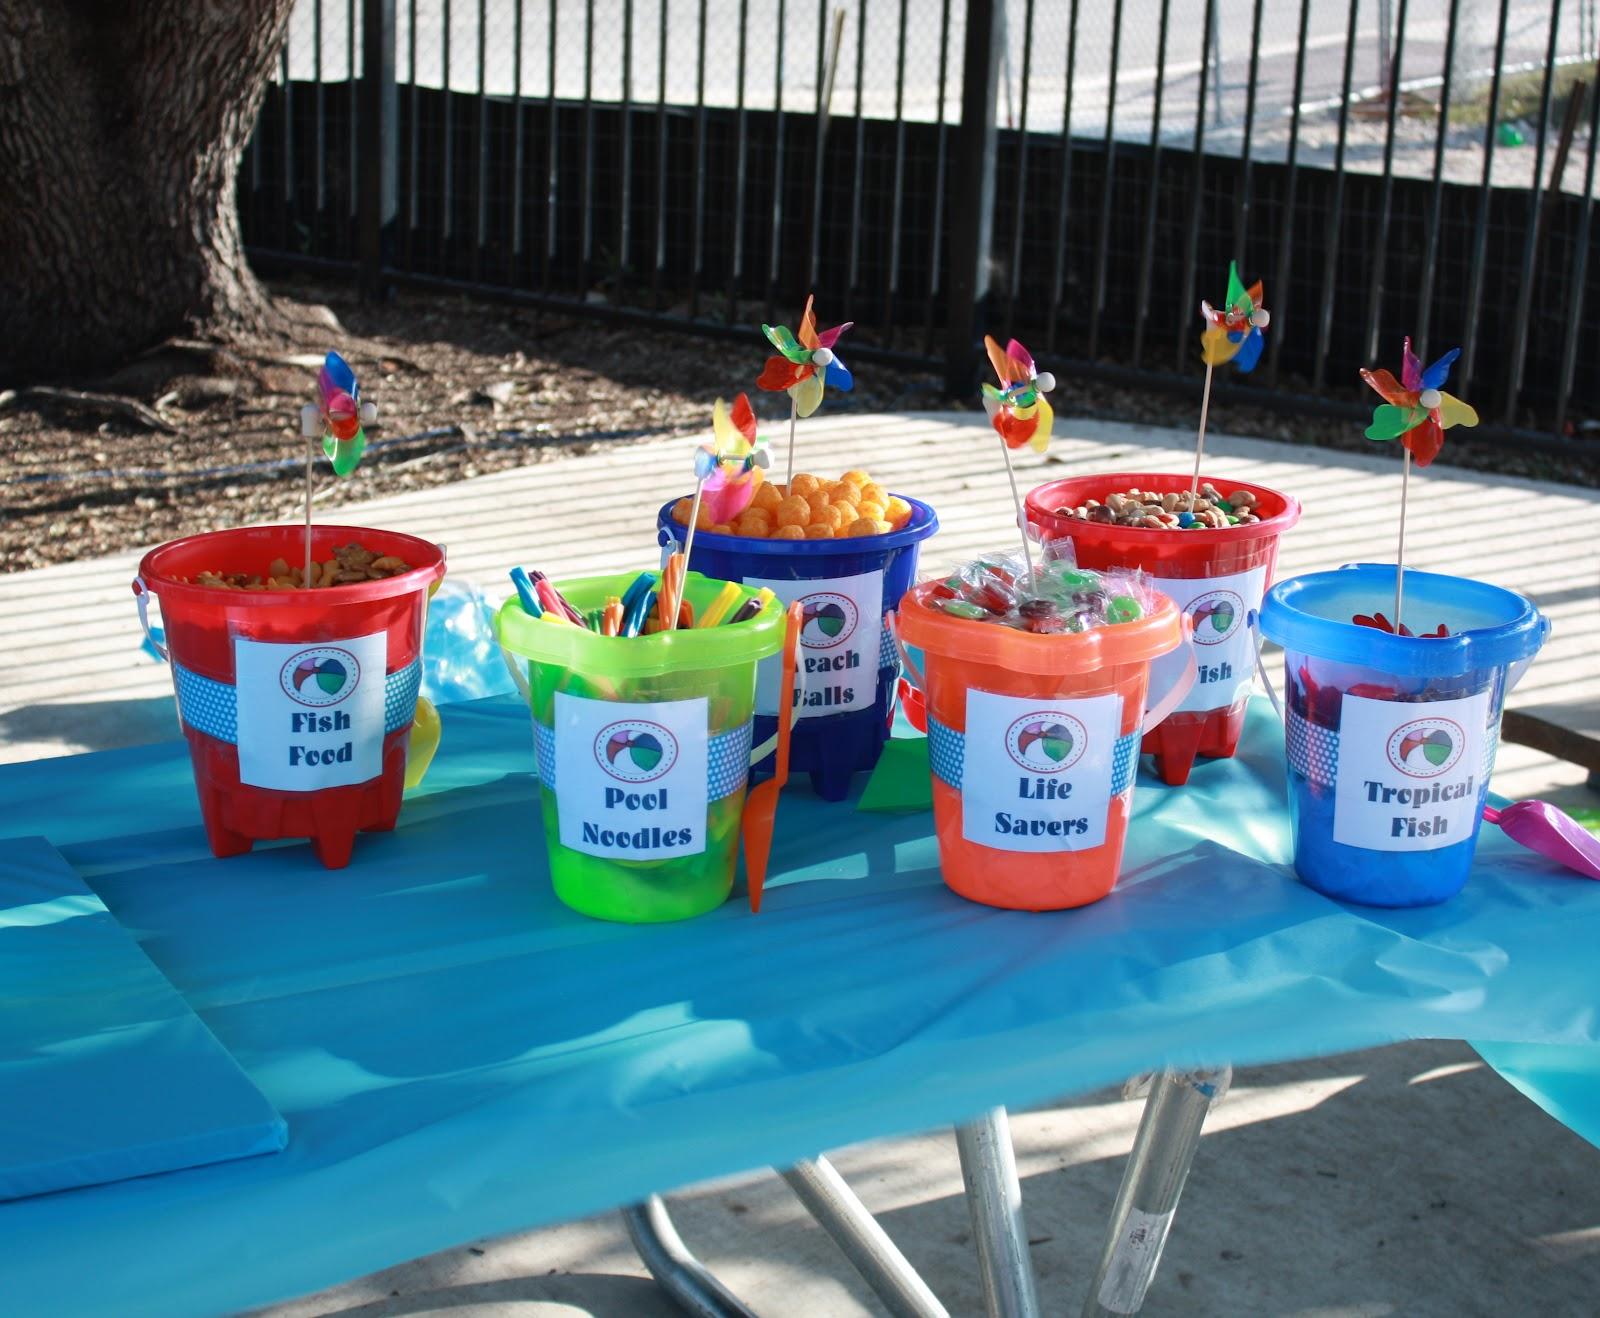 Mom swim bike run nicholas 39 9th birthday party a pool party - Swimming pool party ideas for kids ...